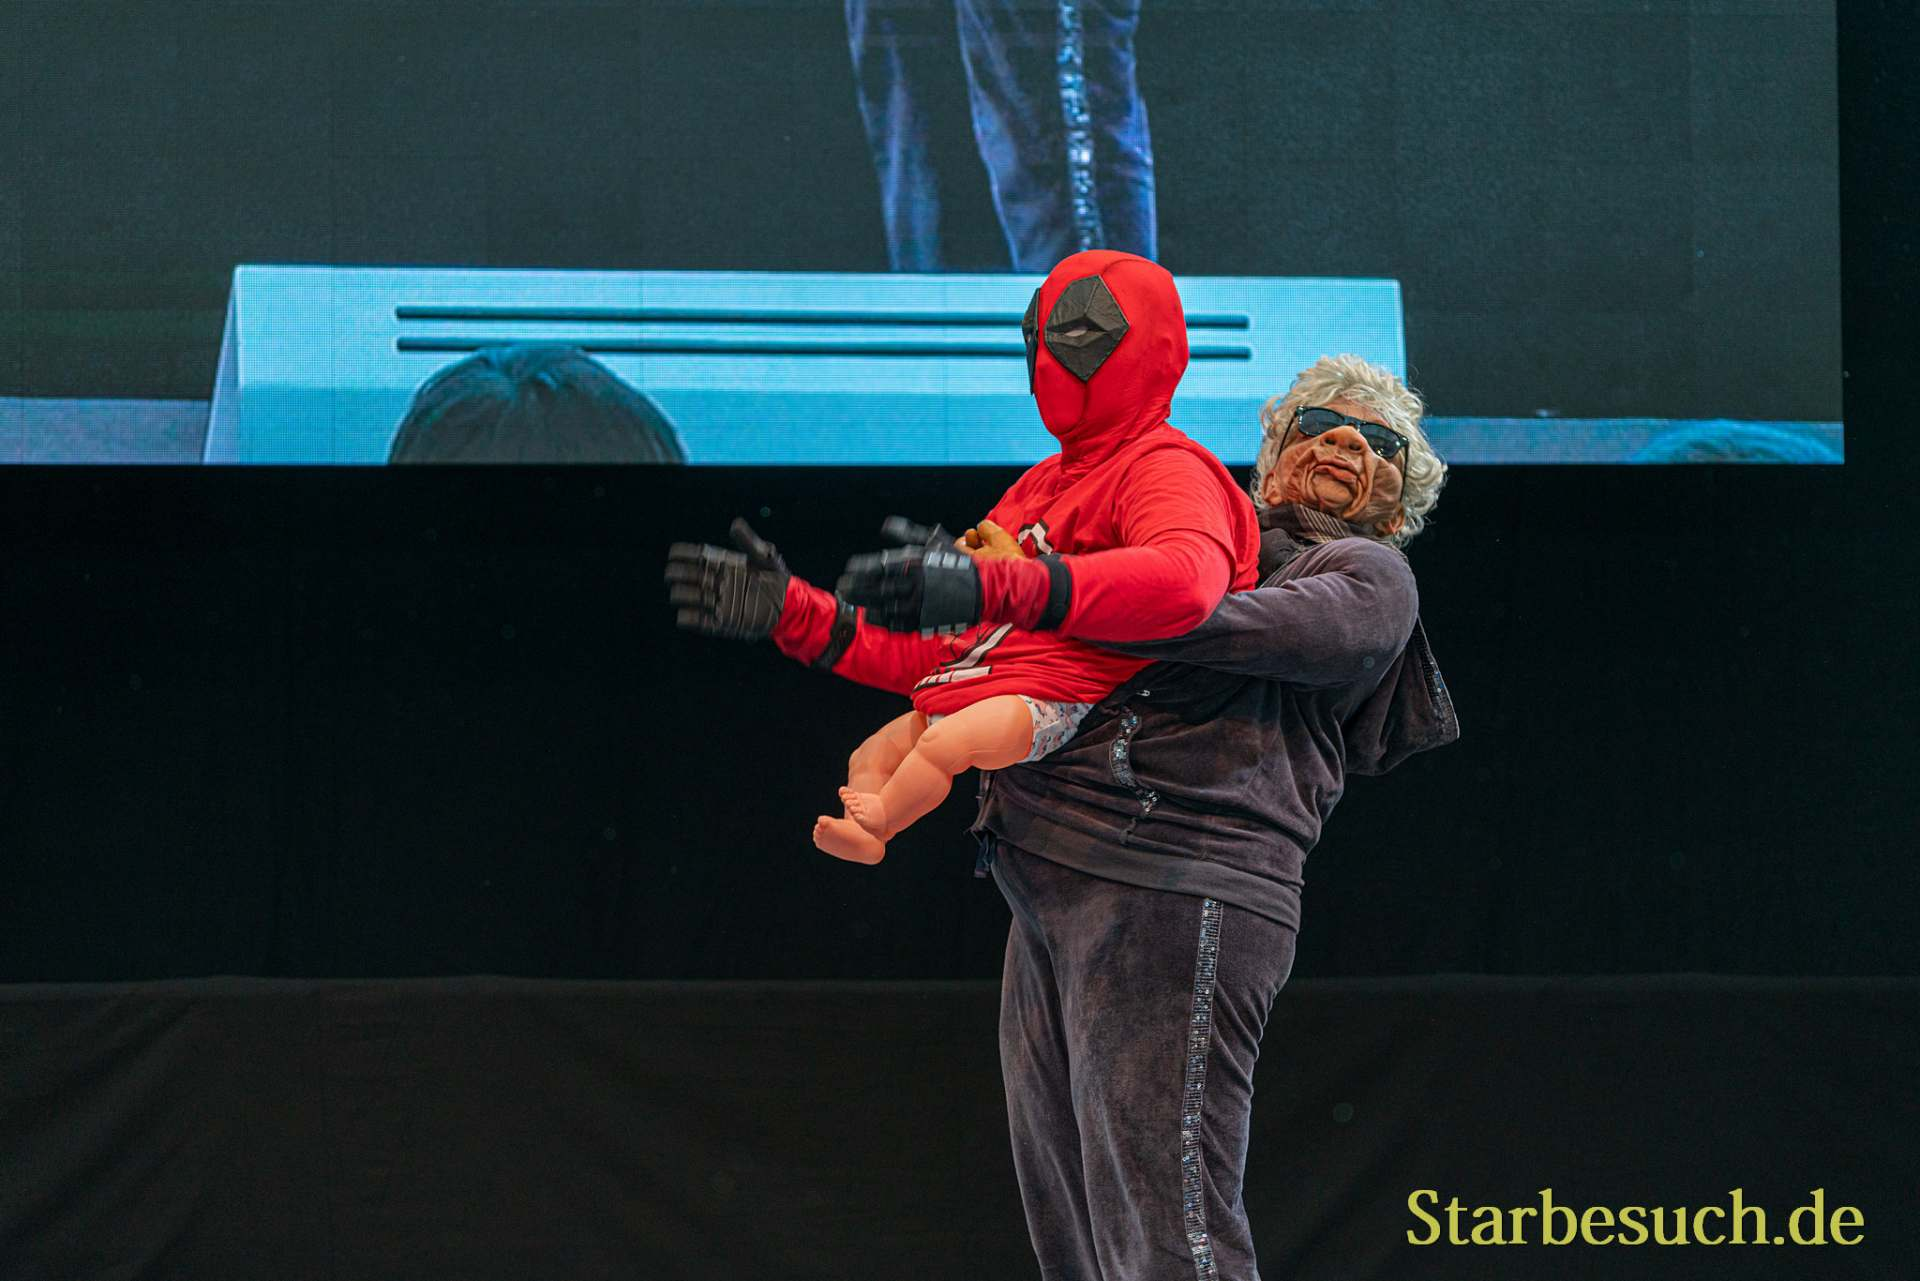 Cosplay Contest #16: Nakawange as Babylegged Deadpool from Deadpool 2